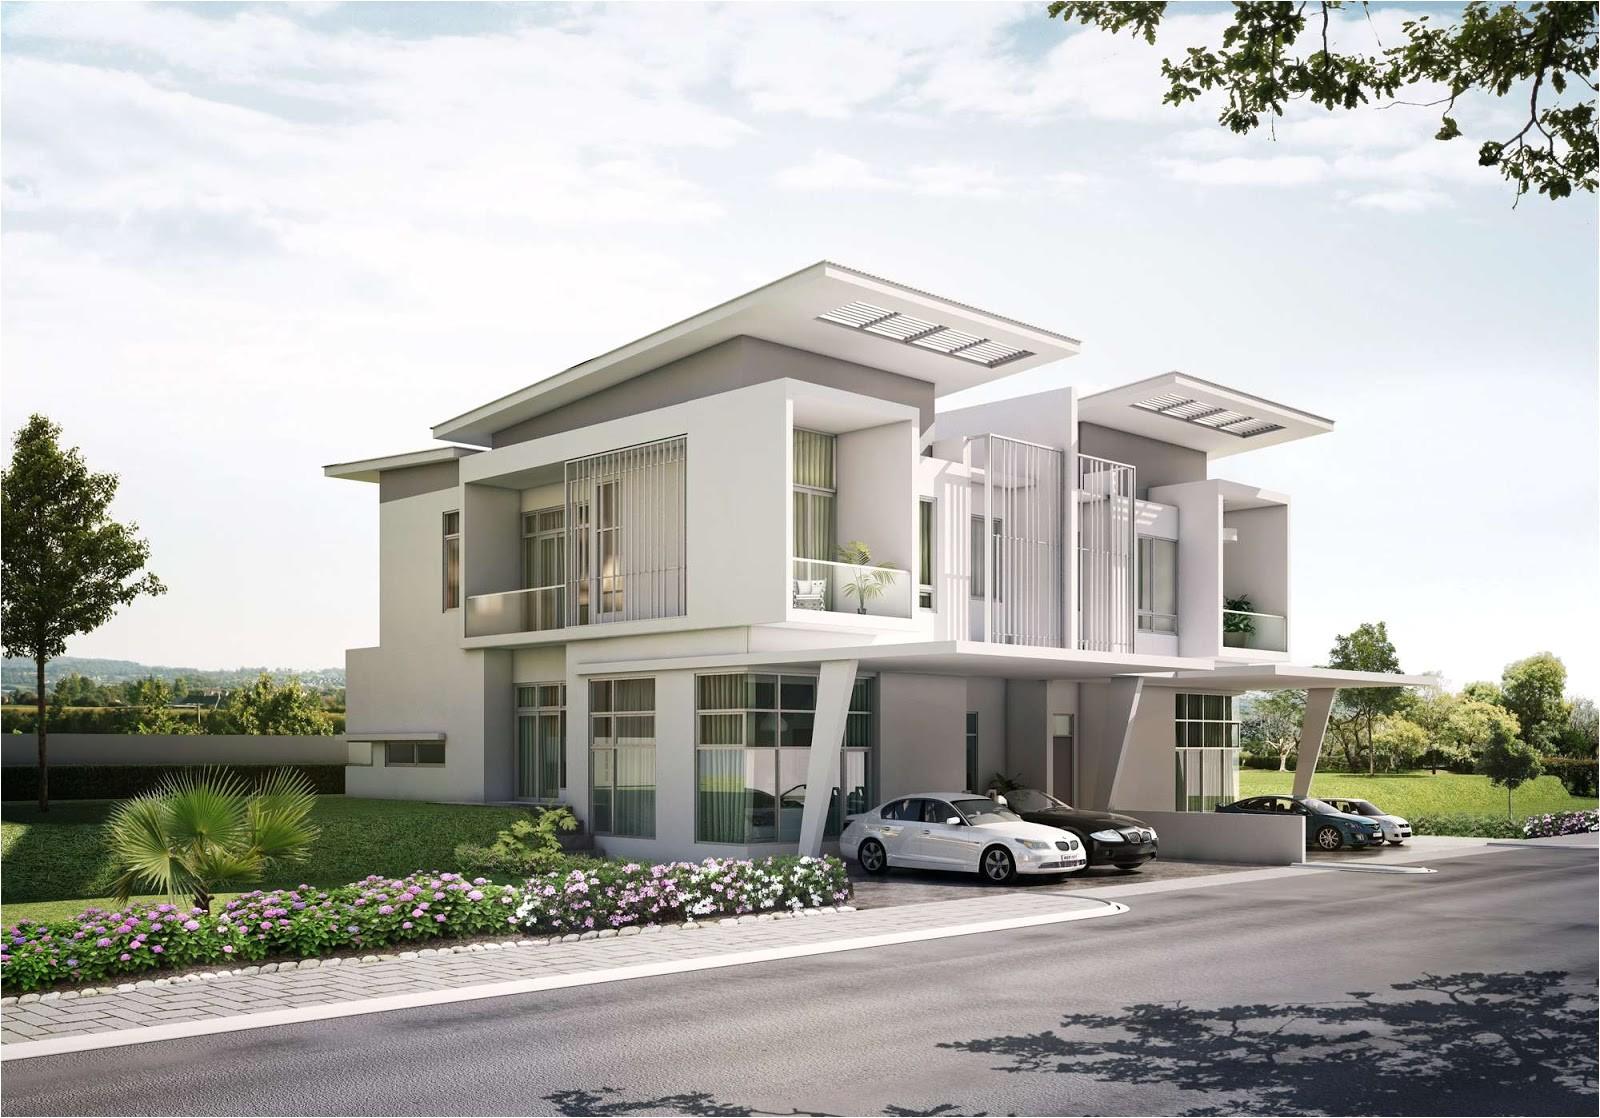 Remodel Home Plans Incredible Contemporary Exterior Design Ideas Design